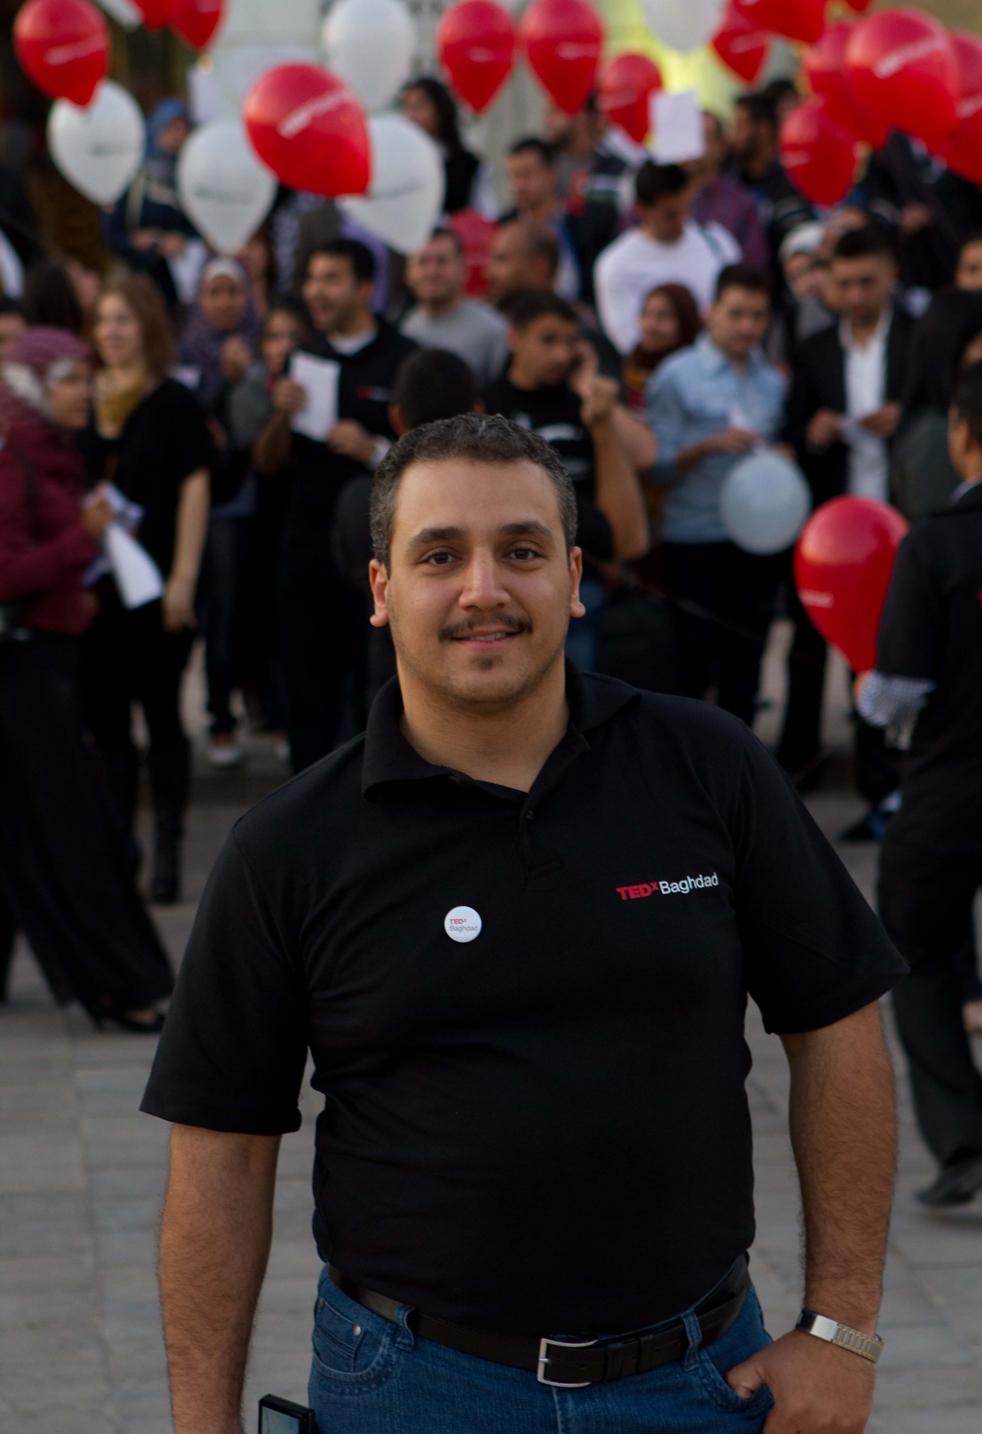 Elaf Mohammed at TEDxBaghdad. Photo: Courtesy of TEDxBaghdad